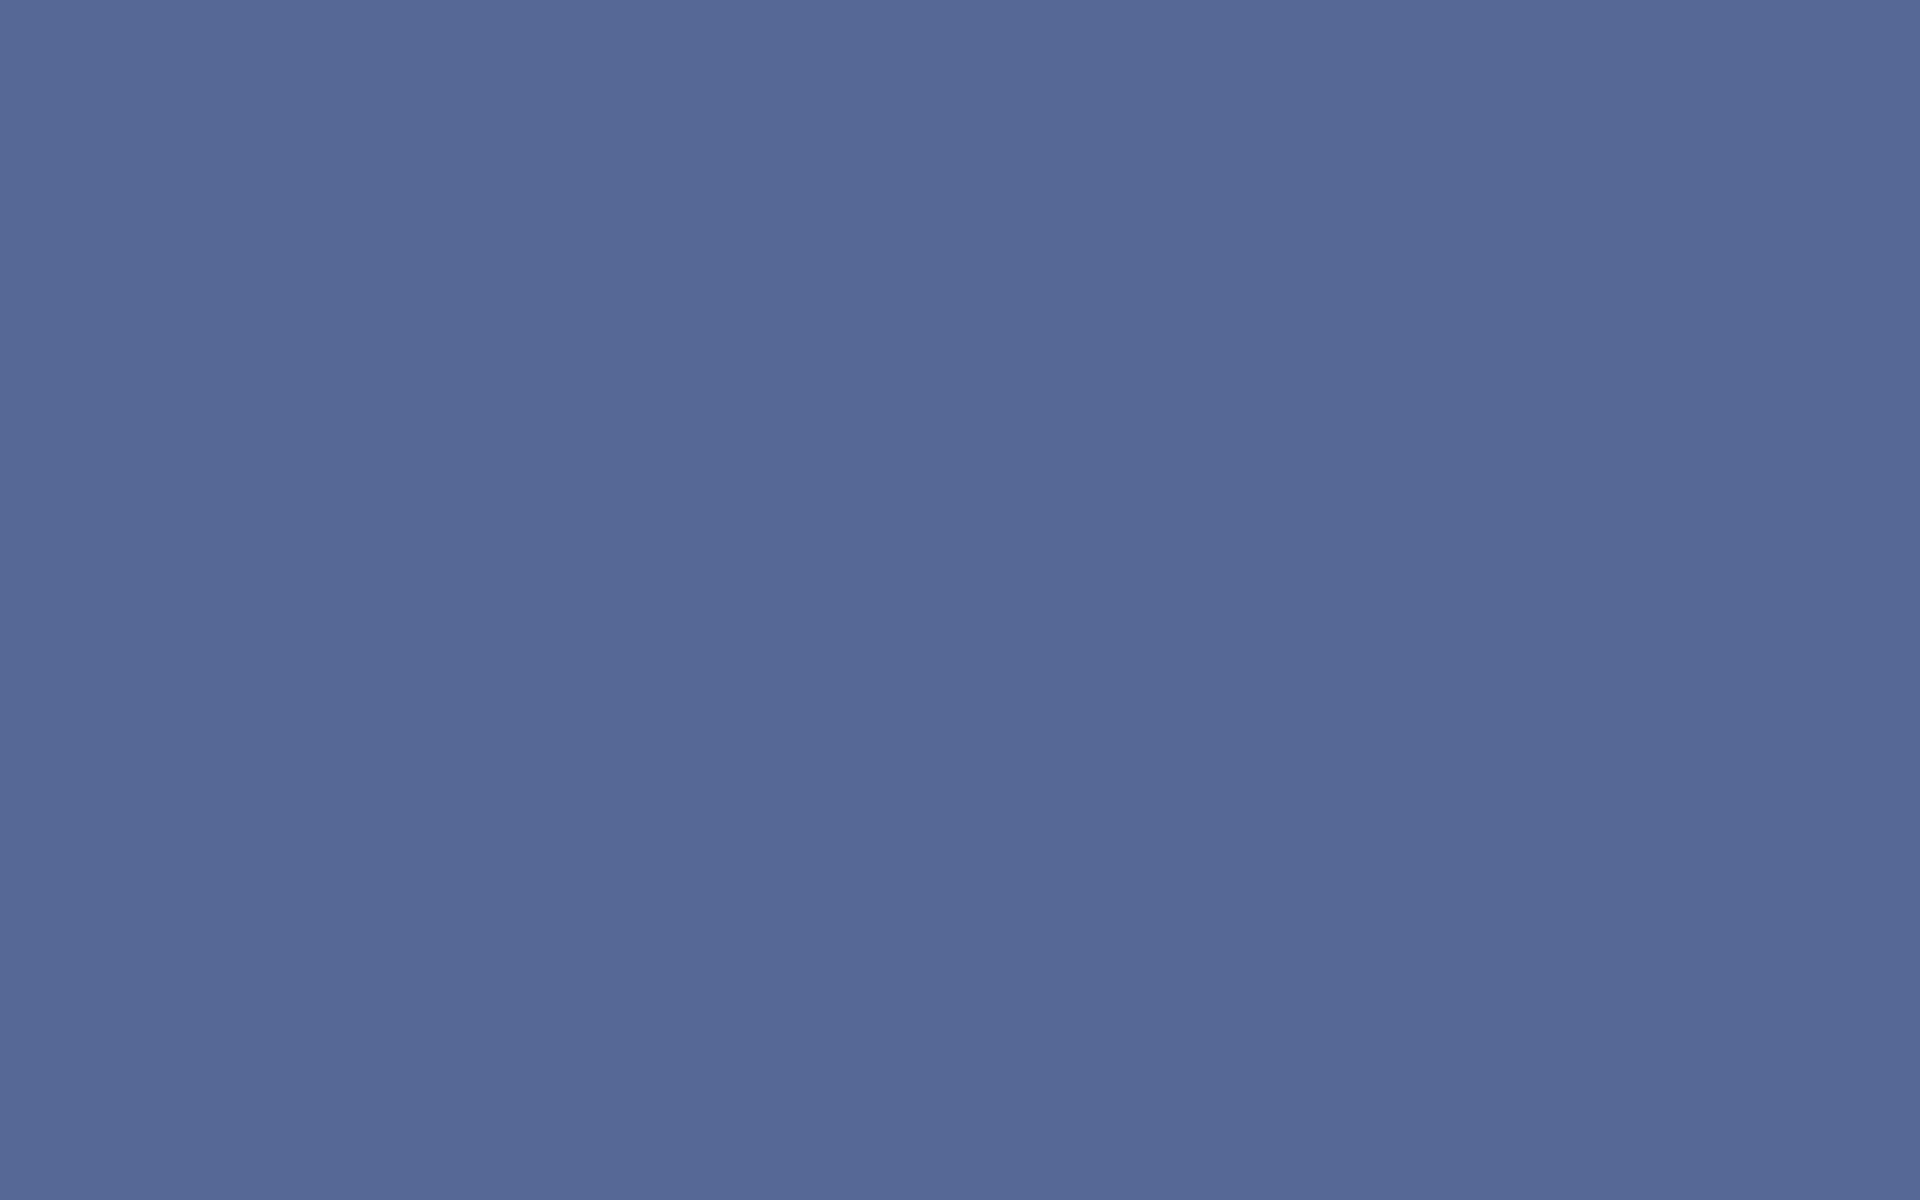 1920x1200 UCLA Blue Solid Color Background